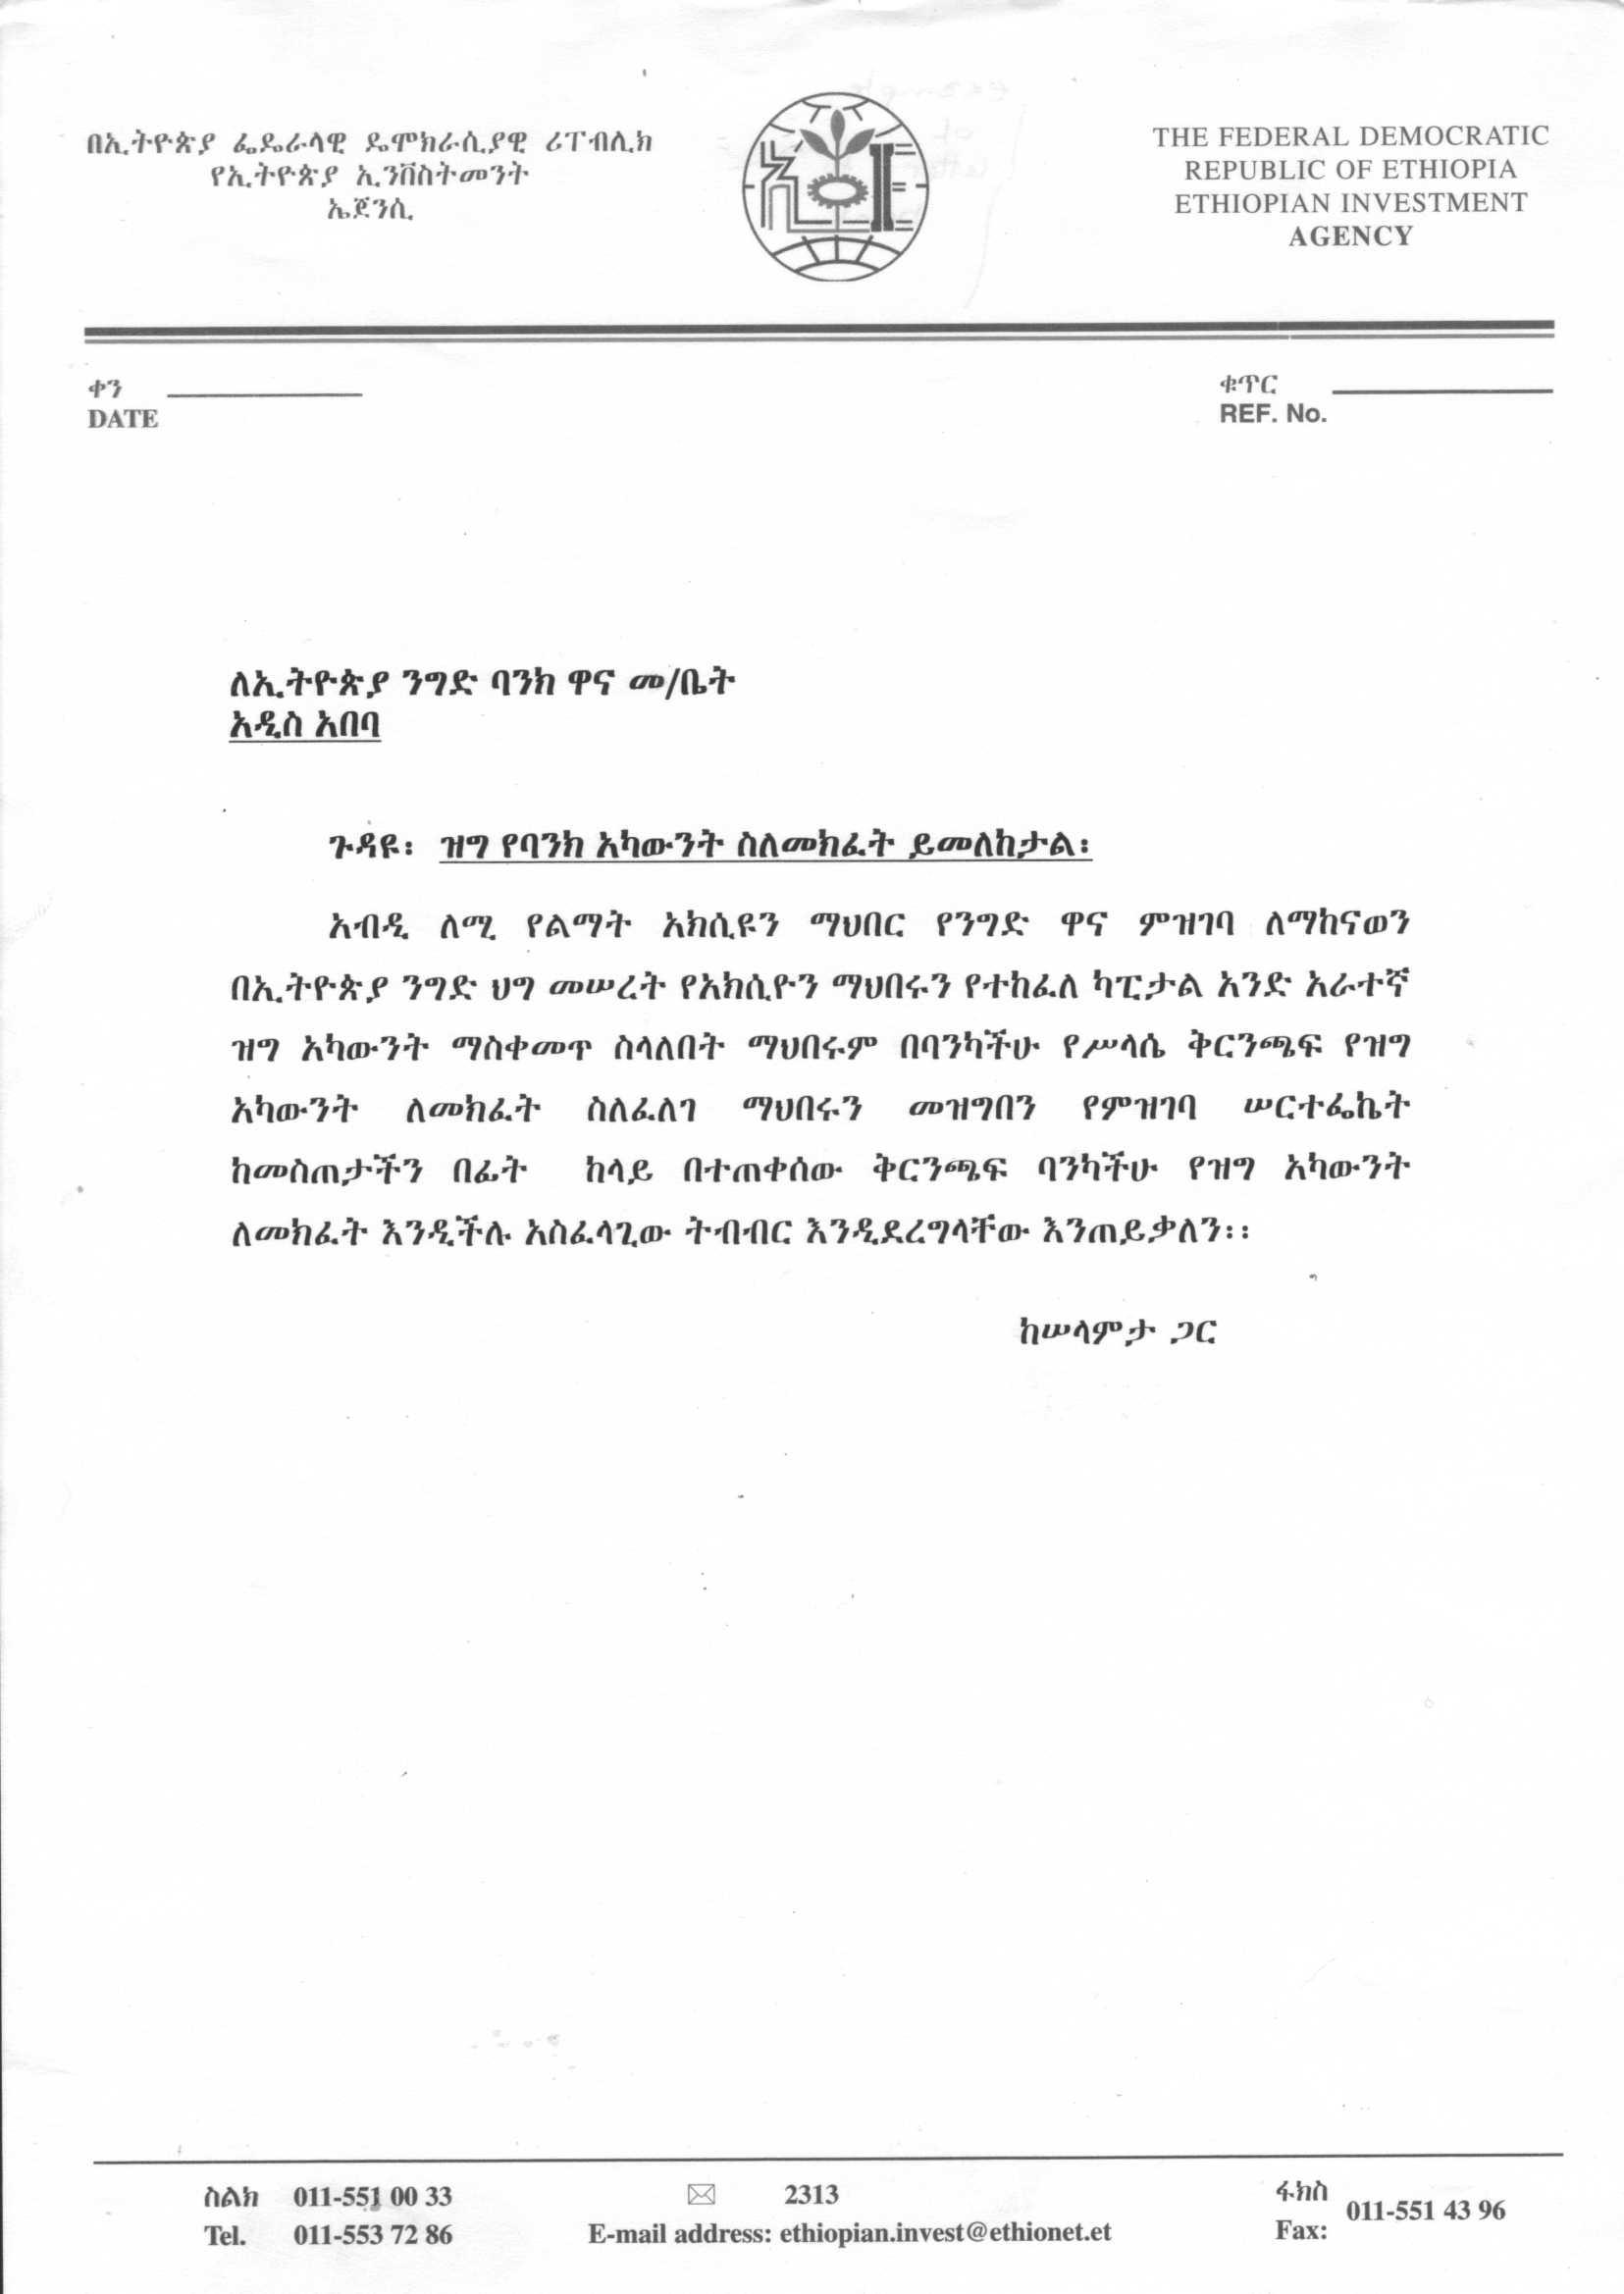 Bank account transfer letter template spiritdancerdesigns Images